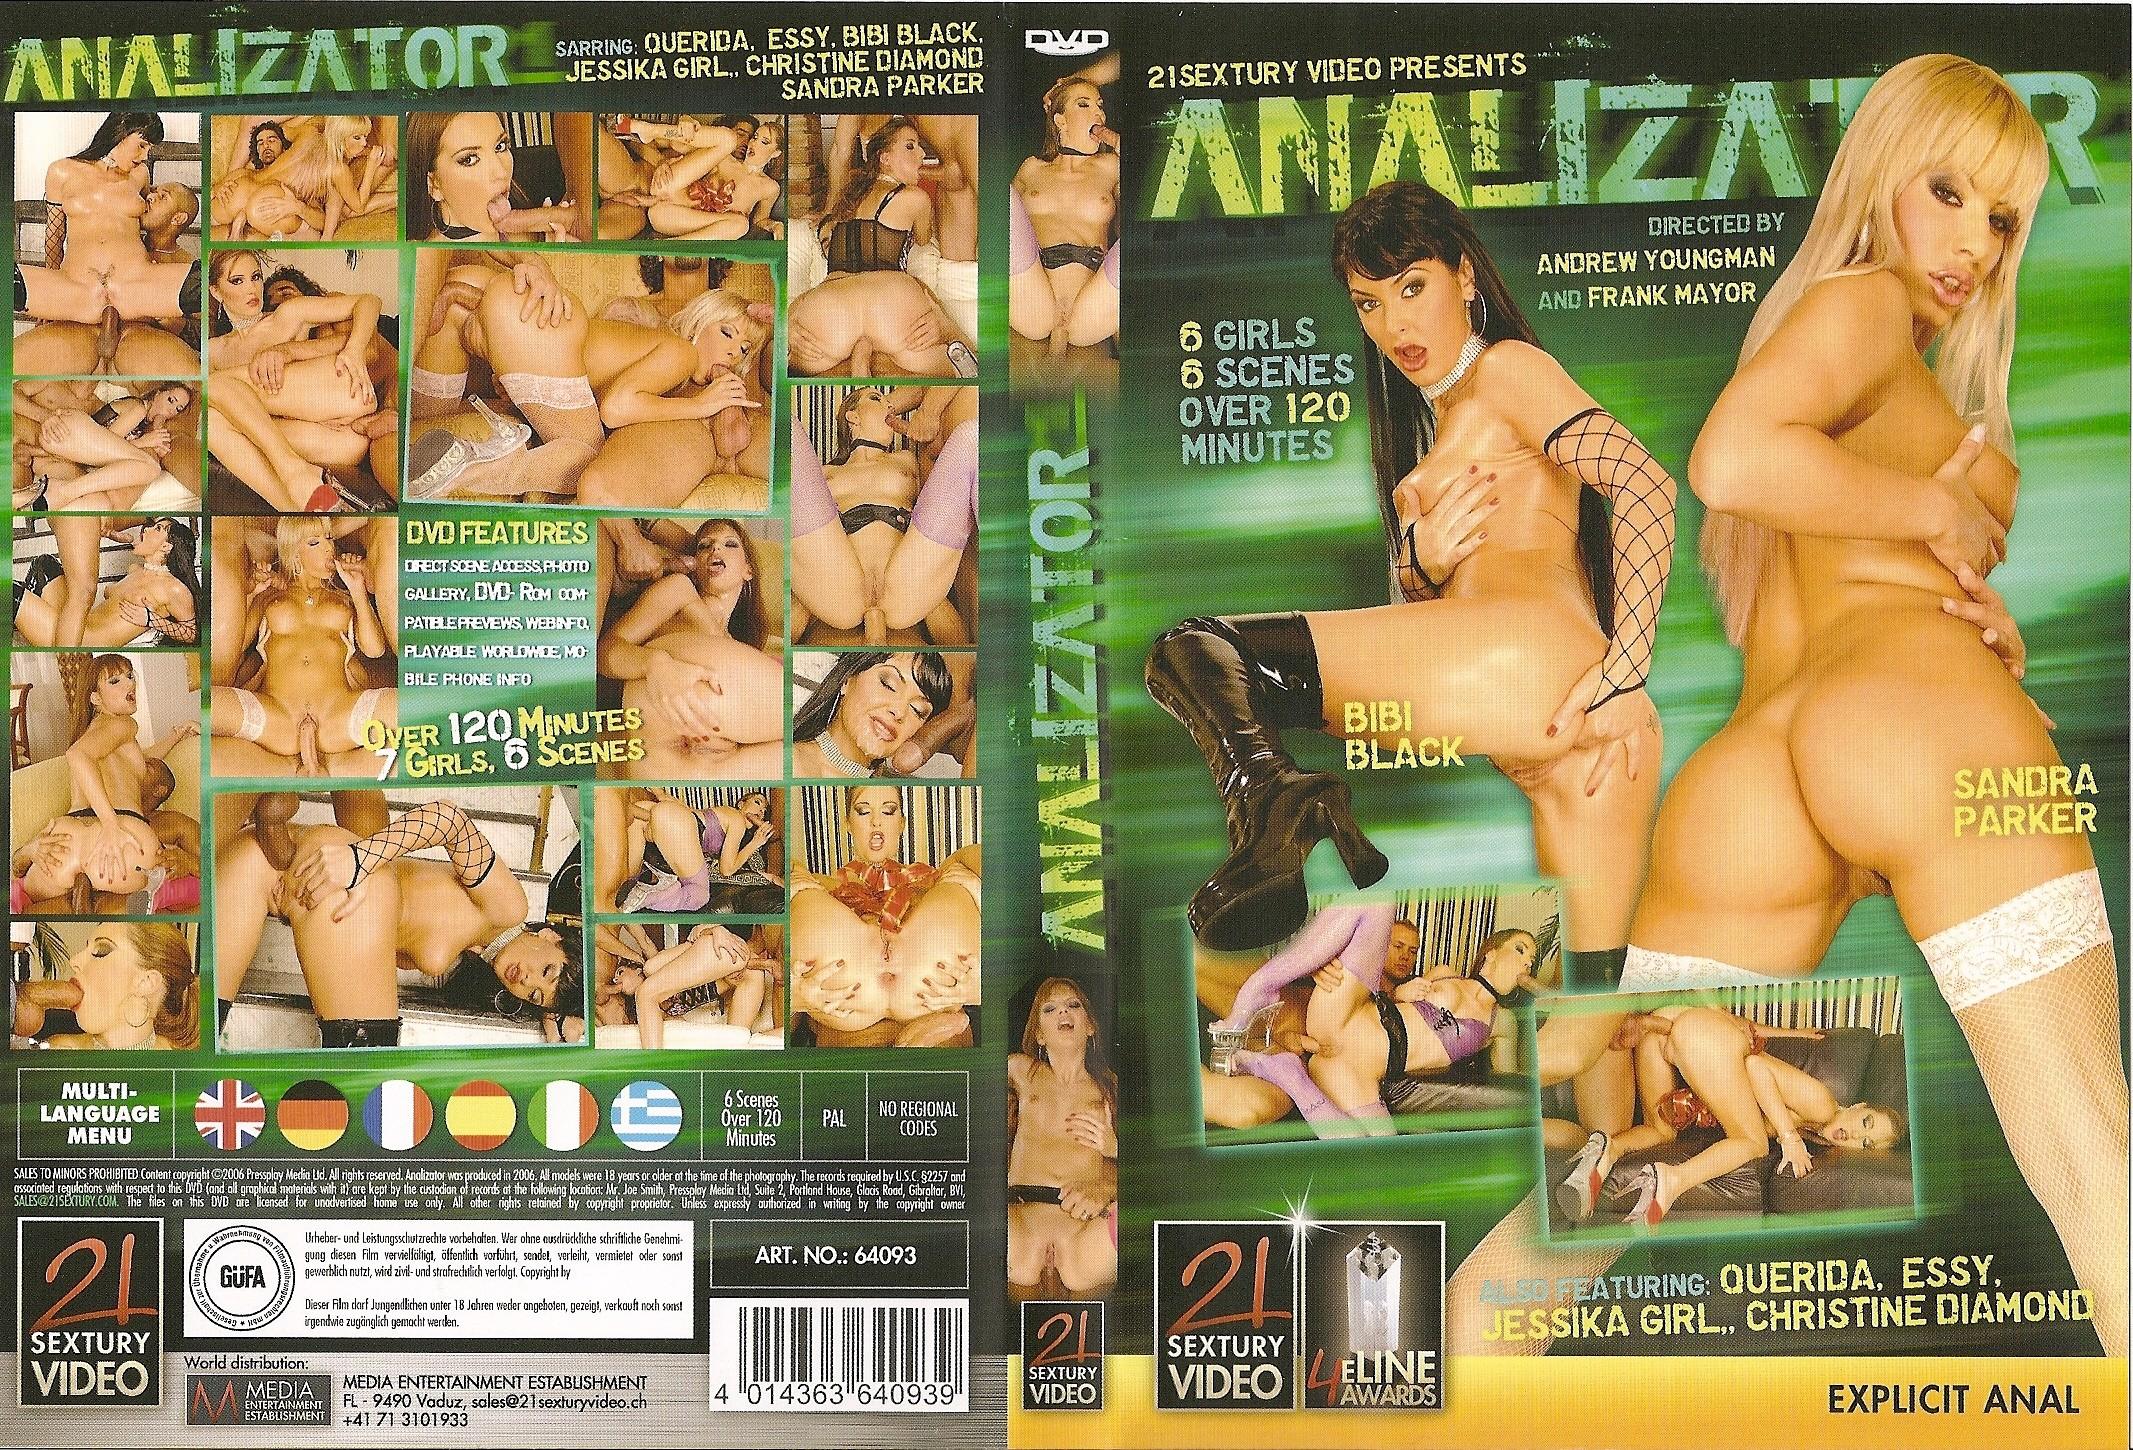 Download free porn dvd's